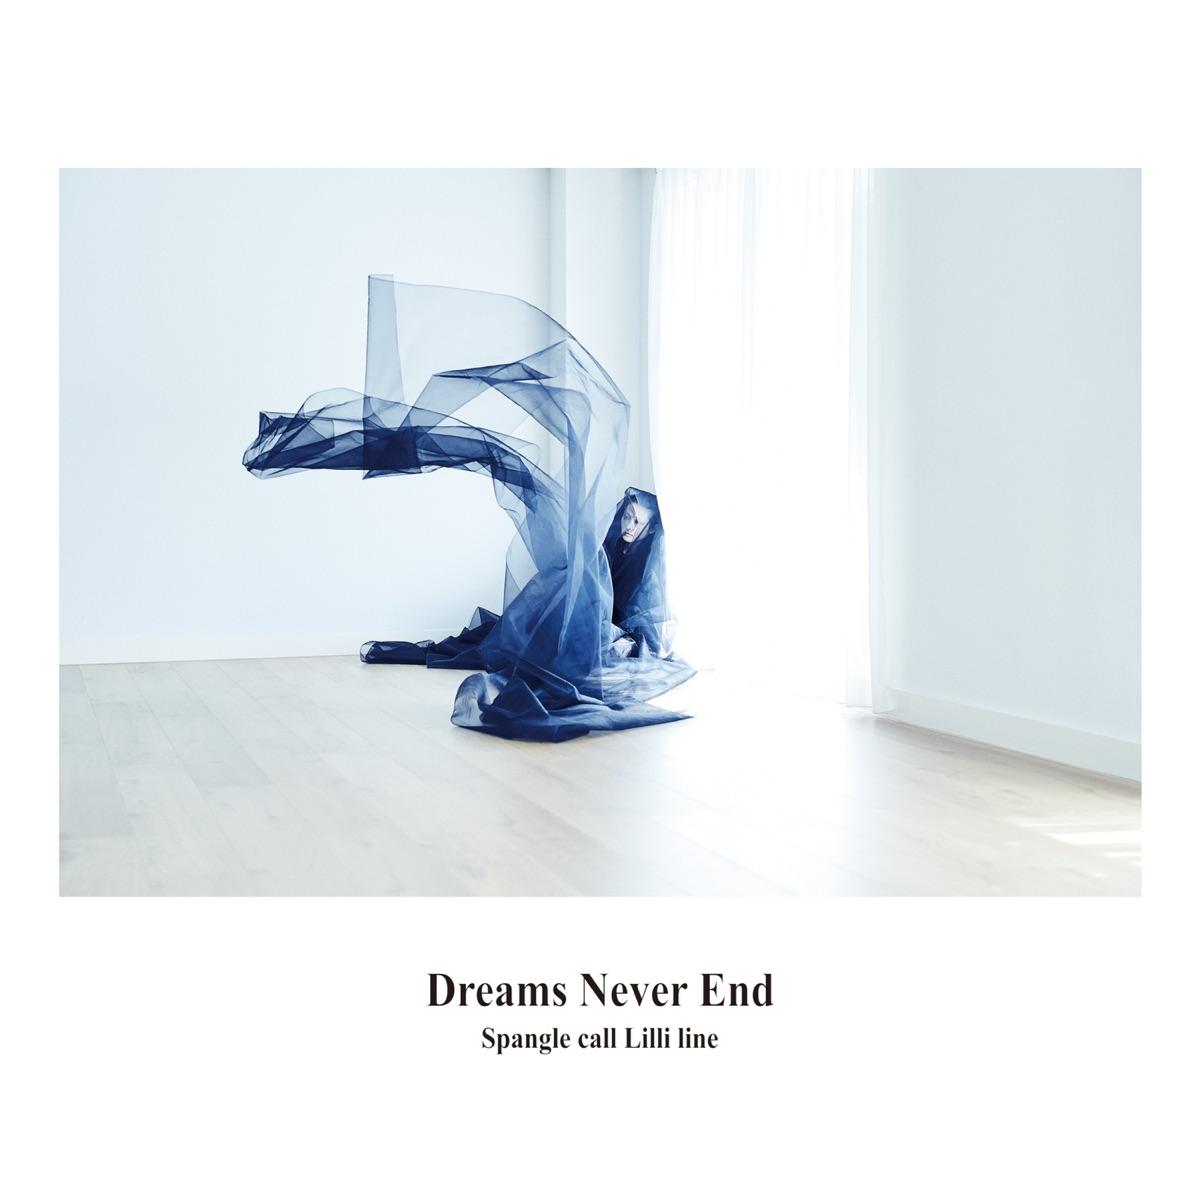 『Spangle call Lilli line - lay low』収録の『Dreams Never End』ジャケット